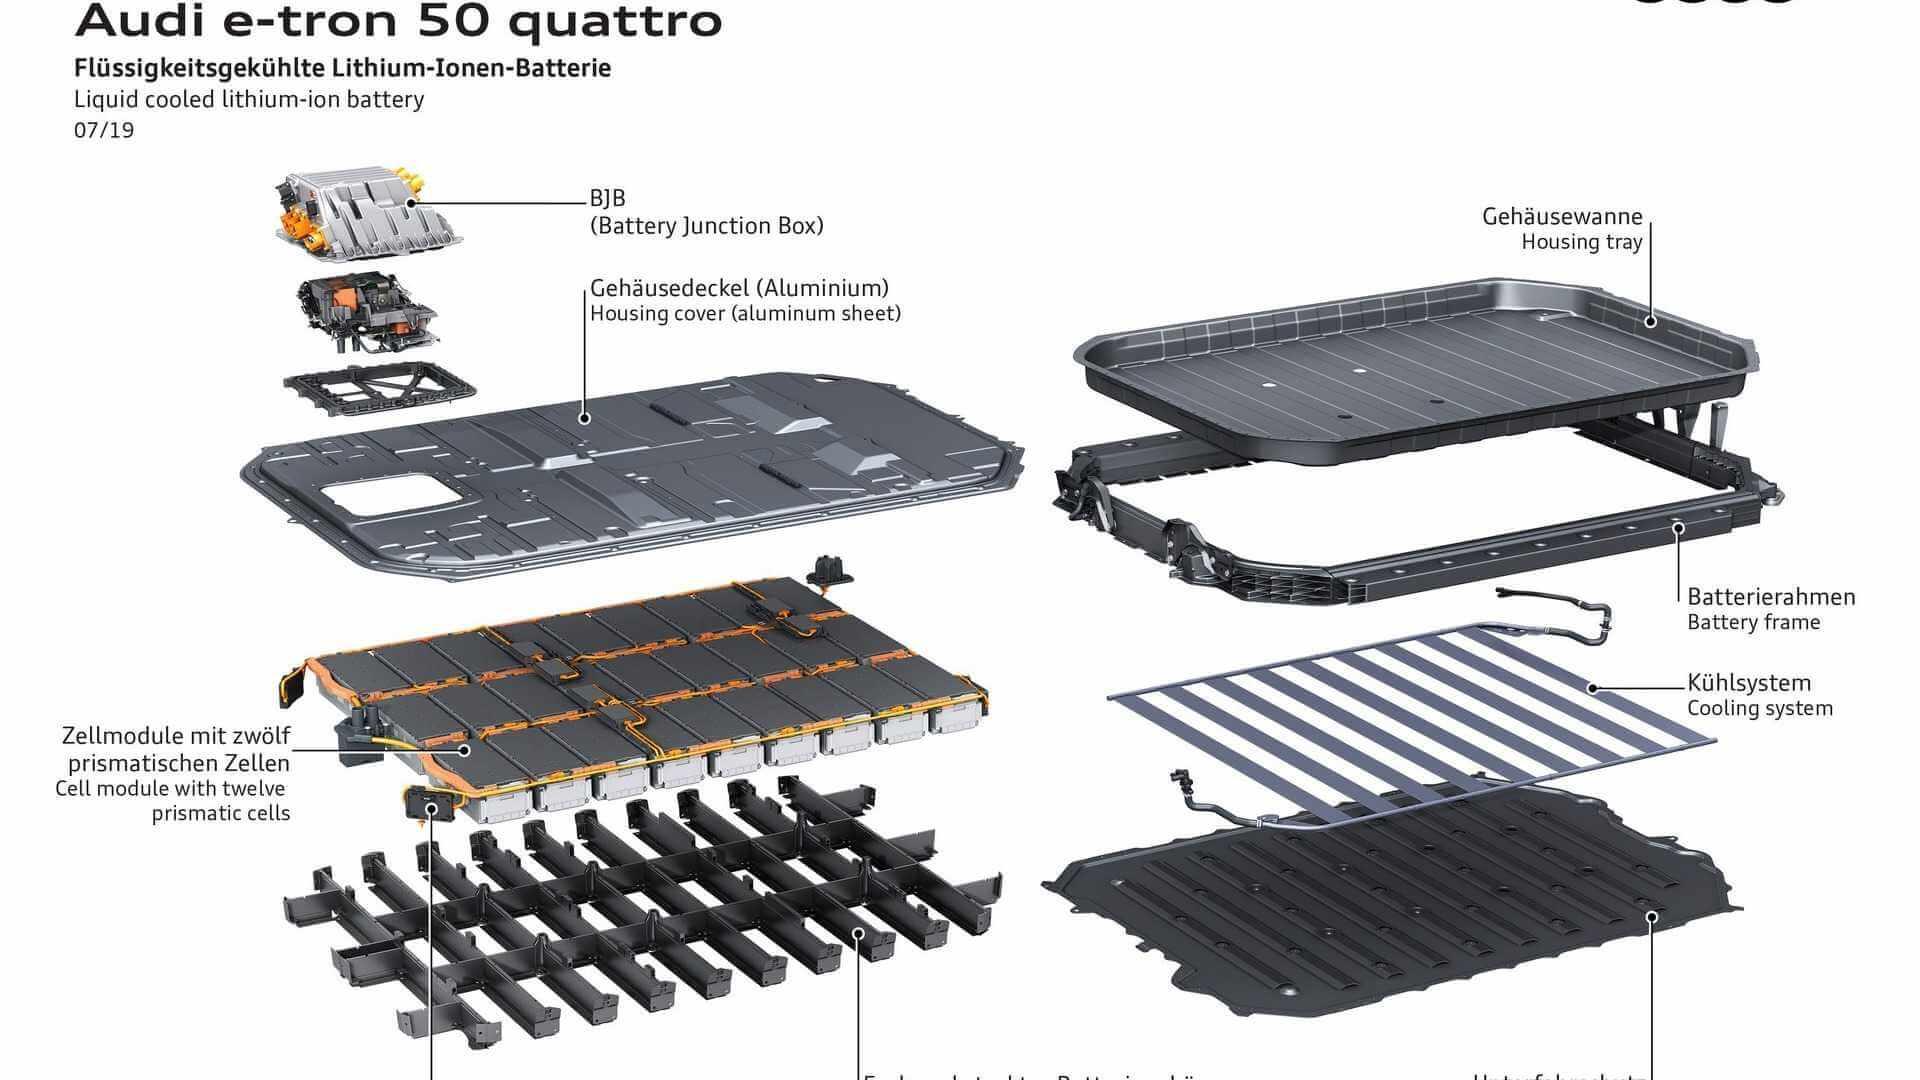 Аккумуляторная батарея Audi e-tron 50 quattro